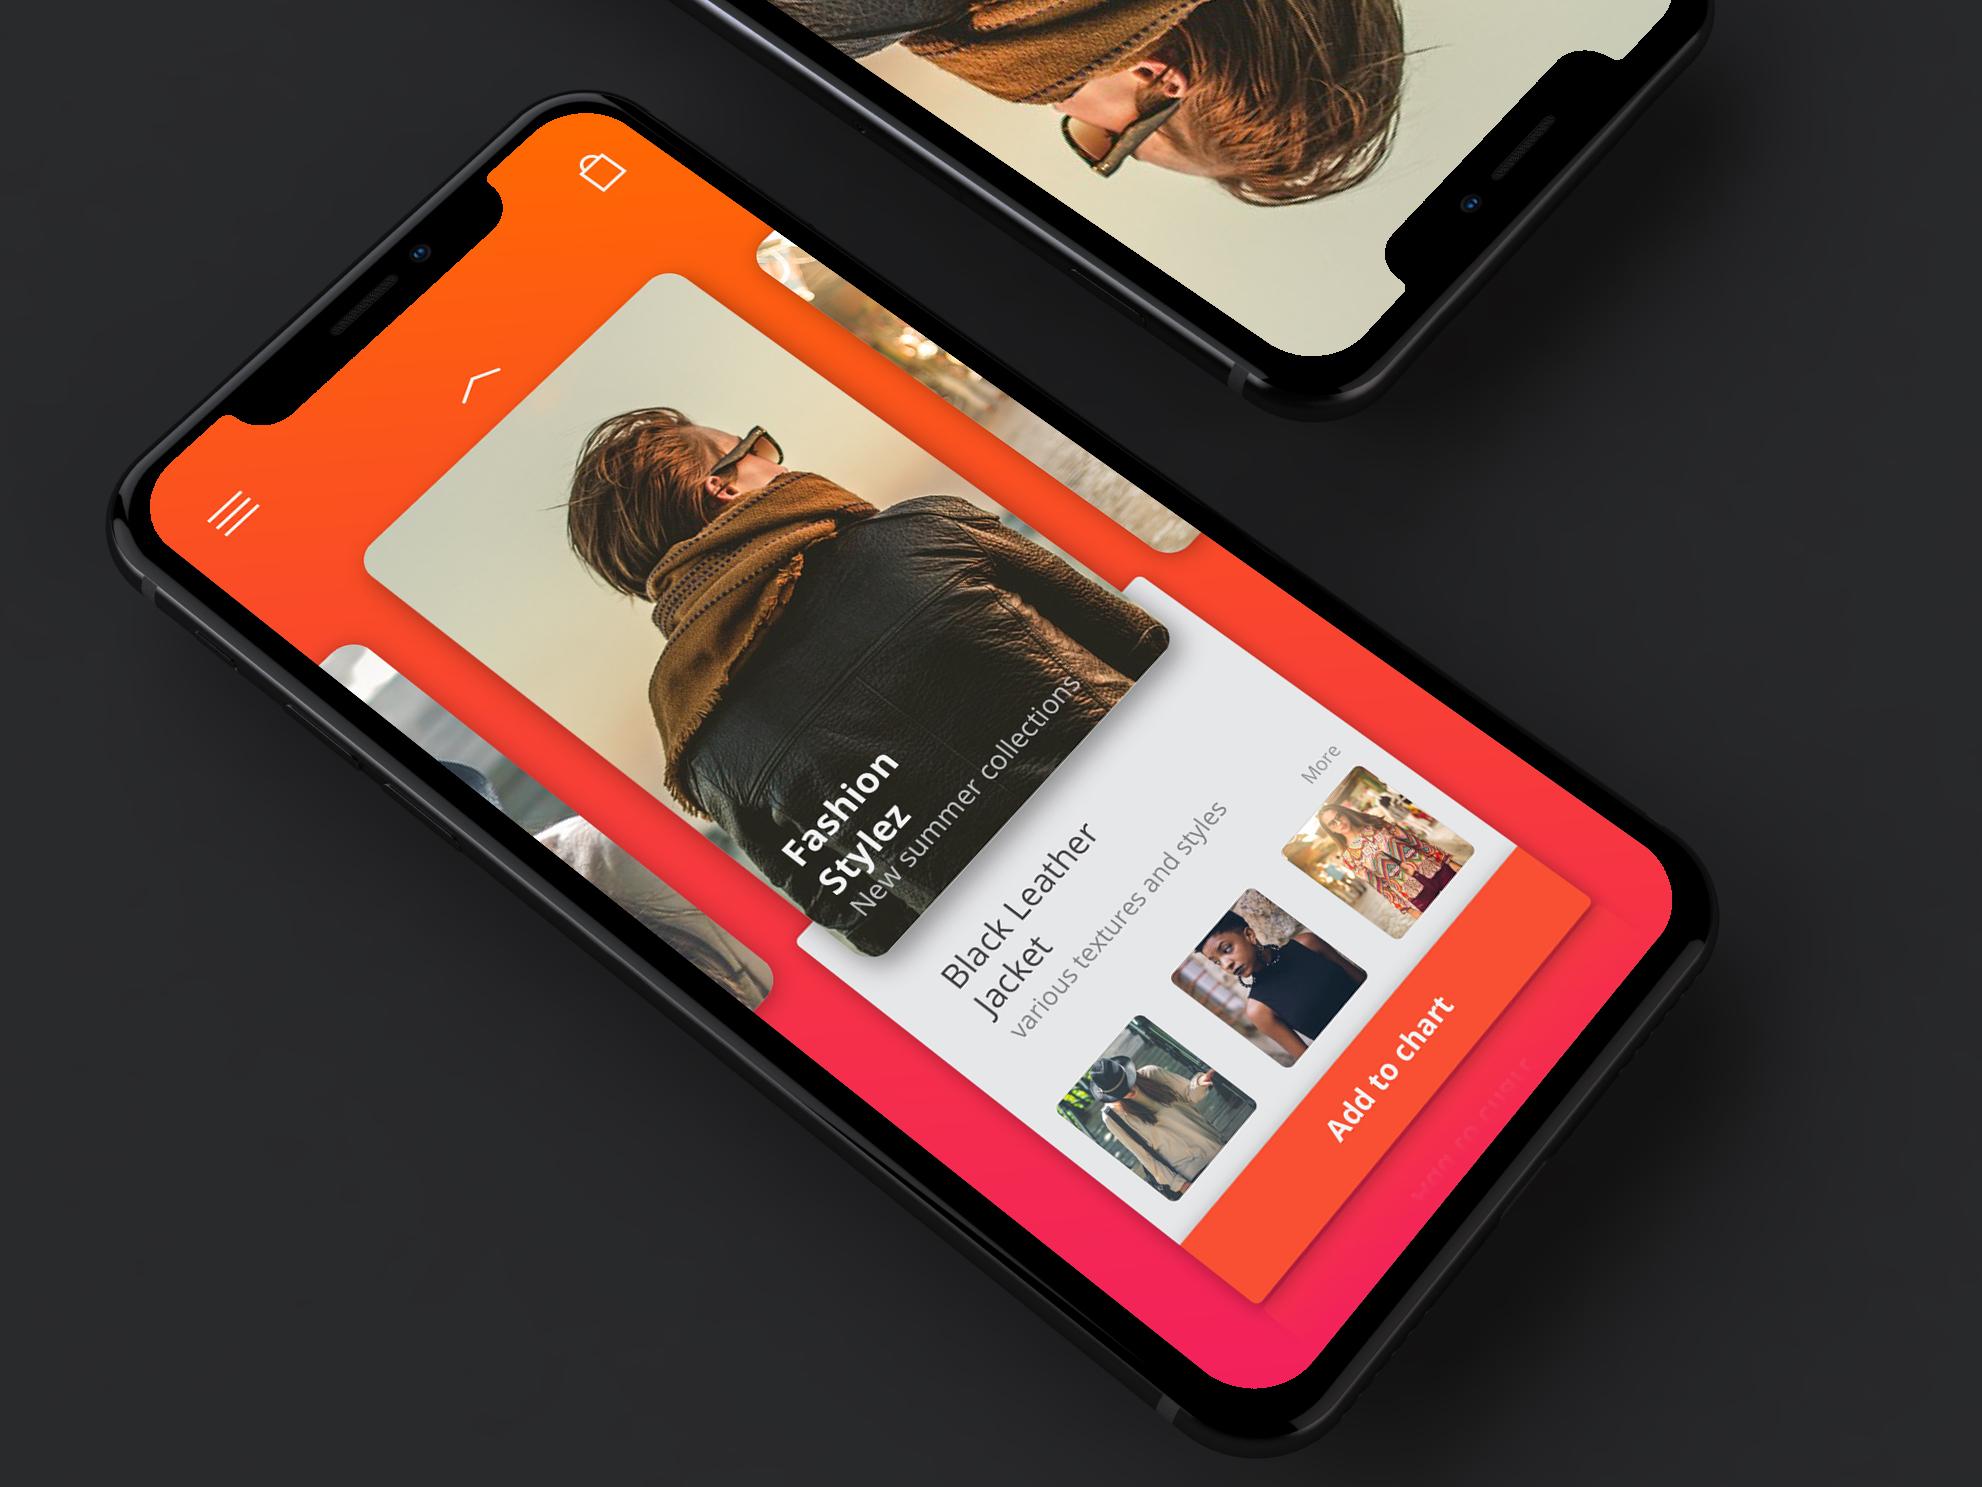 Fasion Apparel App Design